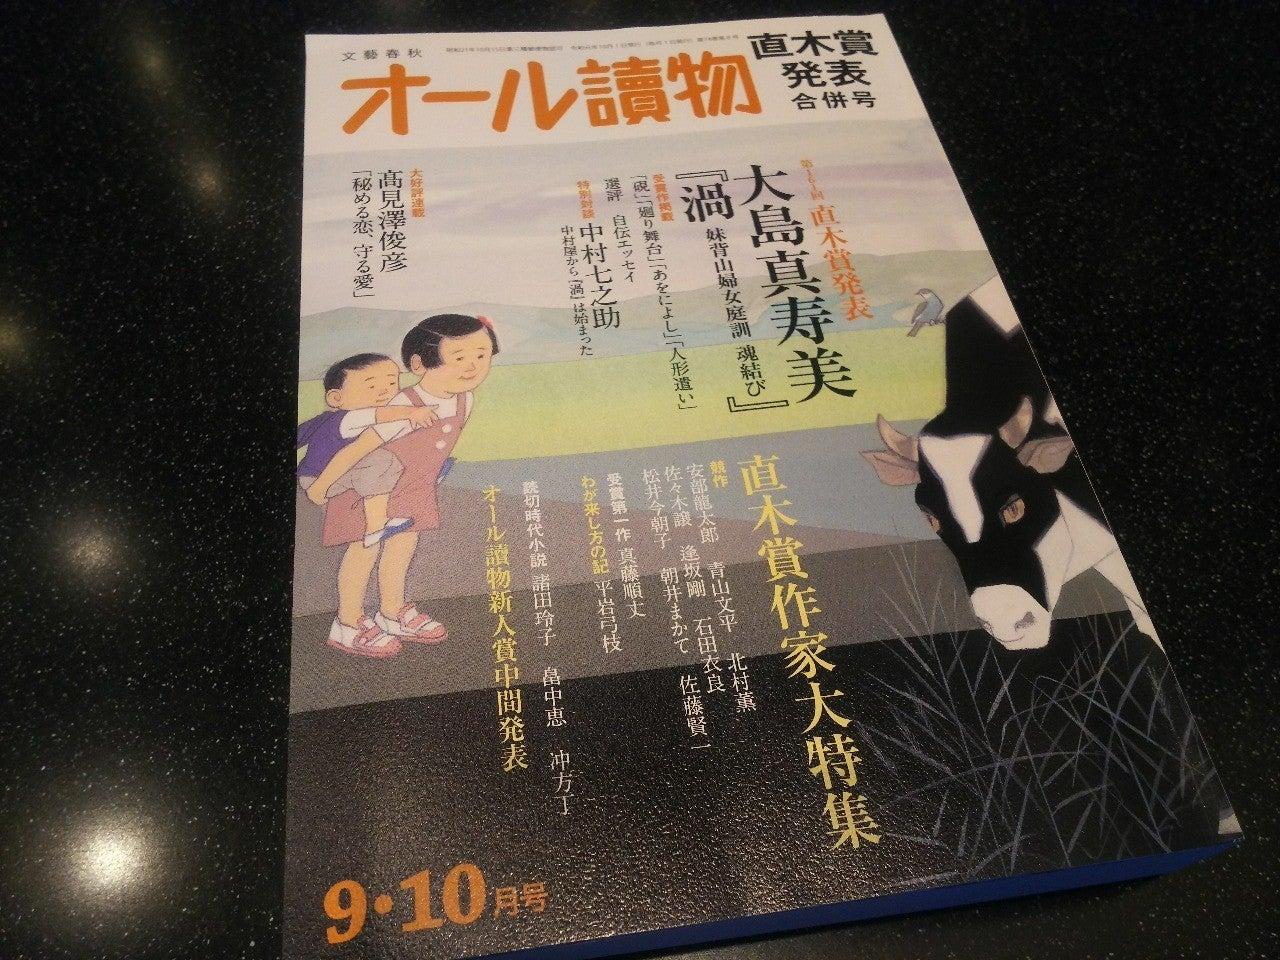 オール 読物 新人 賞